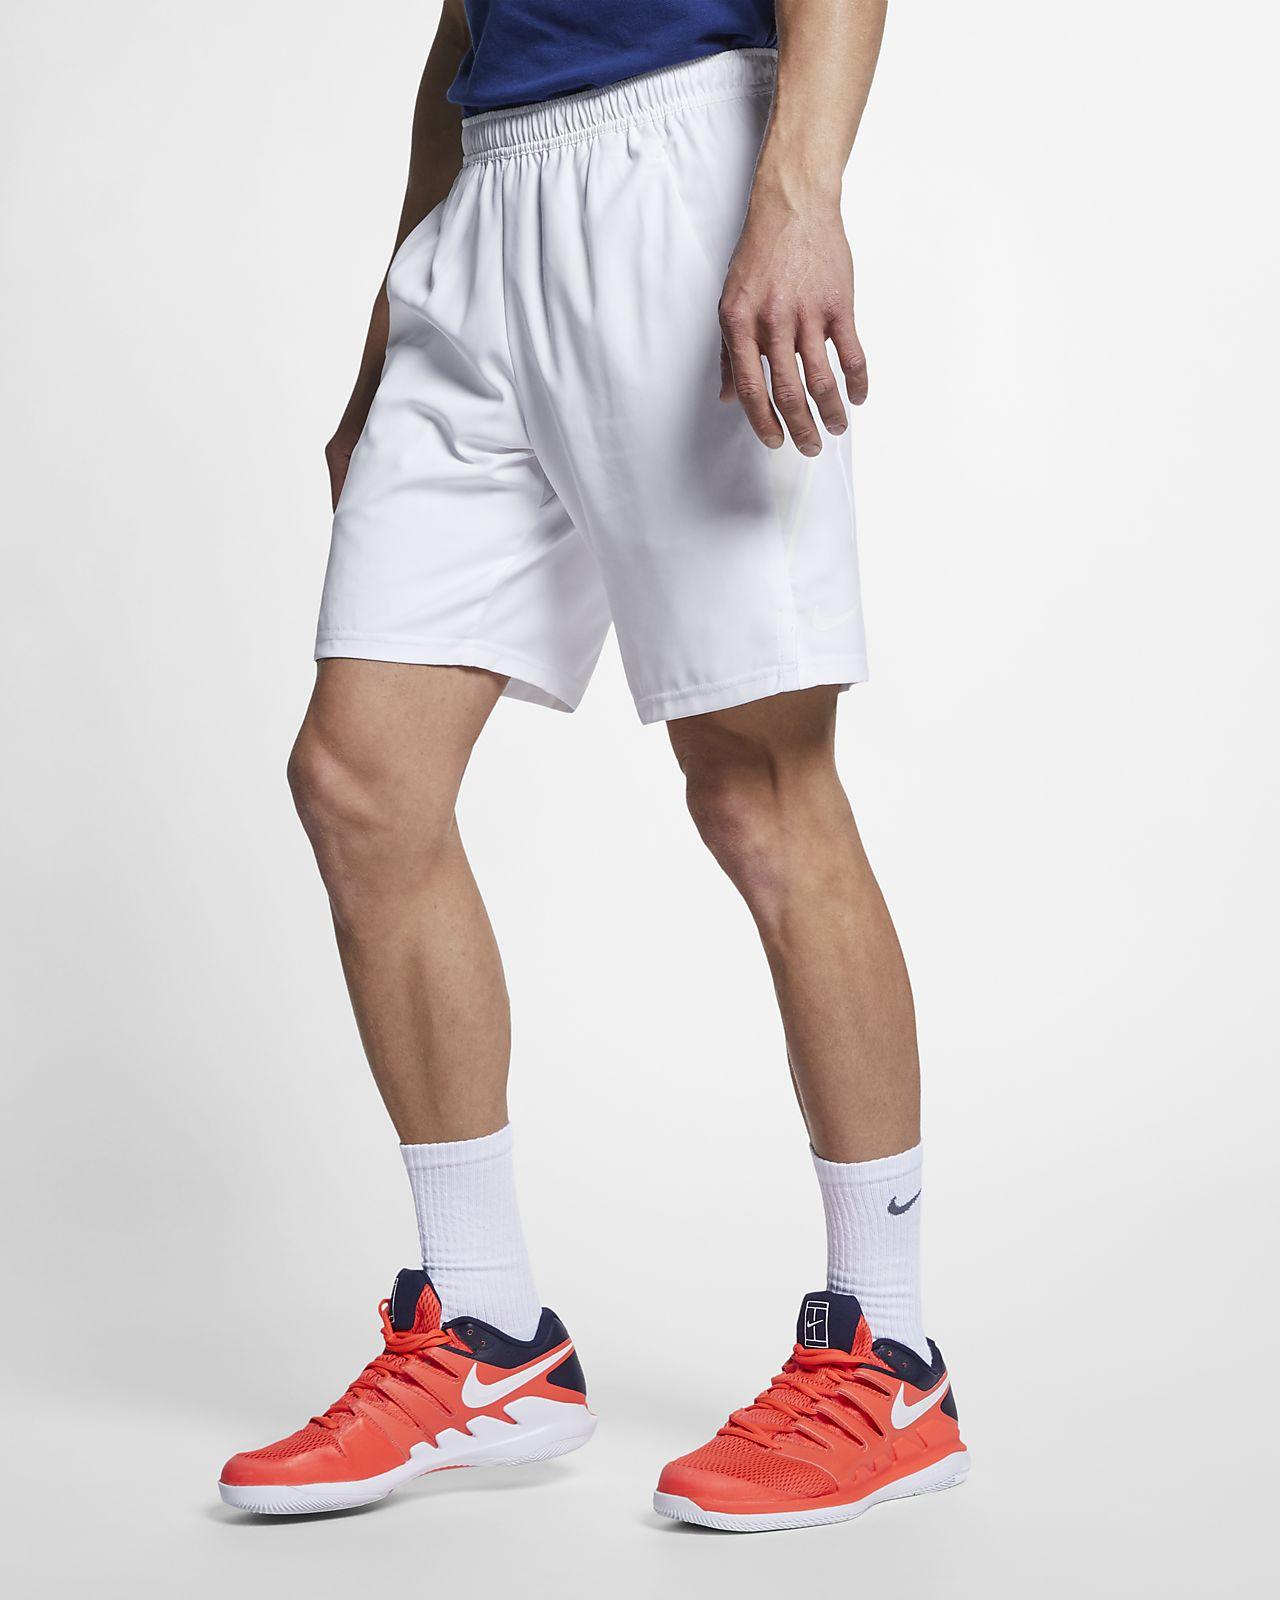 NikeCourt Dri-FIT Men's 23cm (approx.) Tennis Shorts